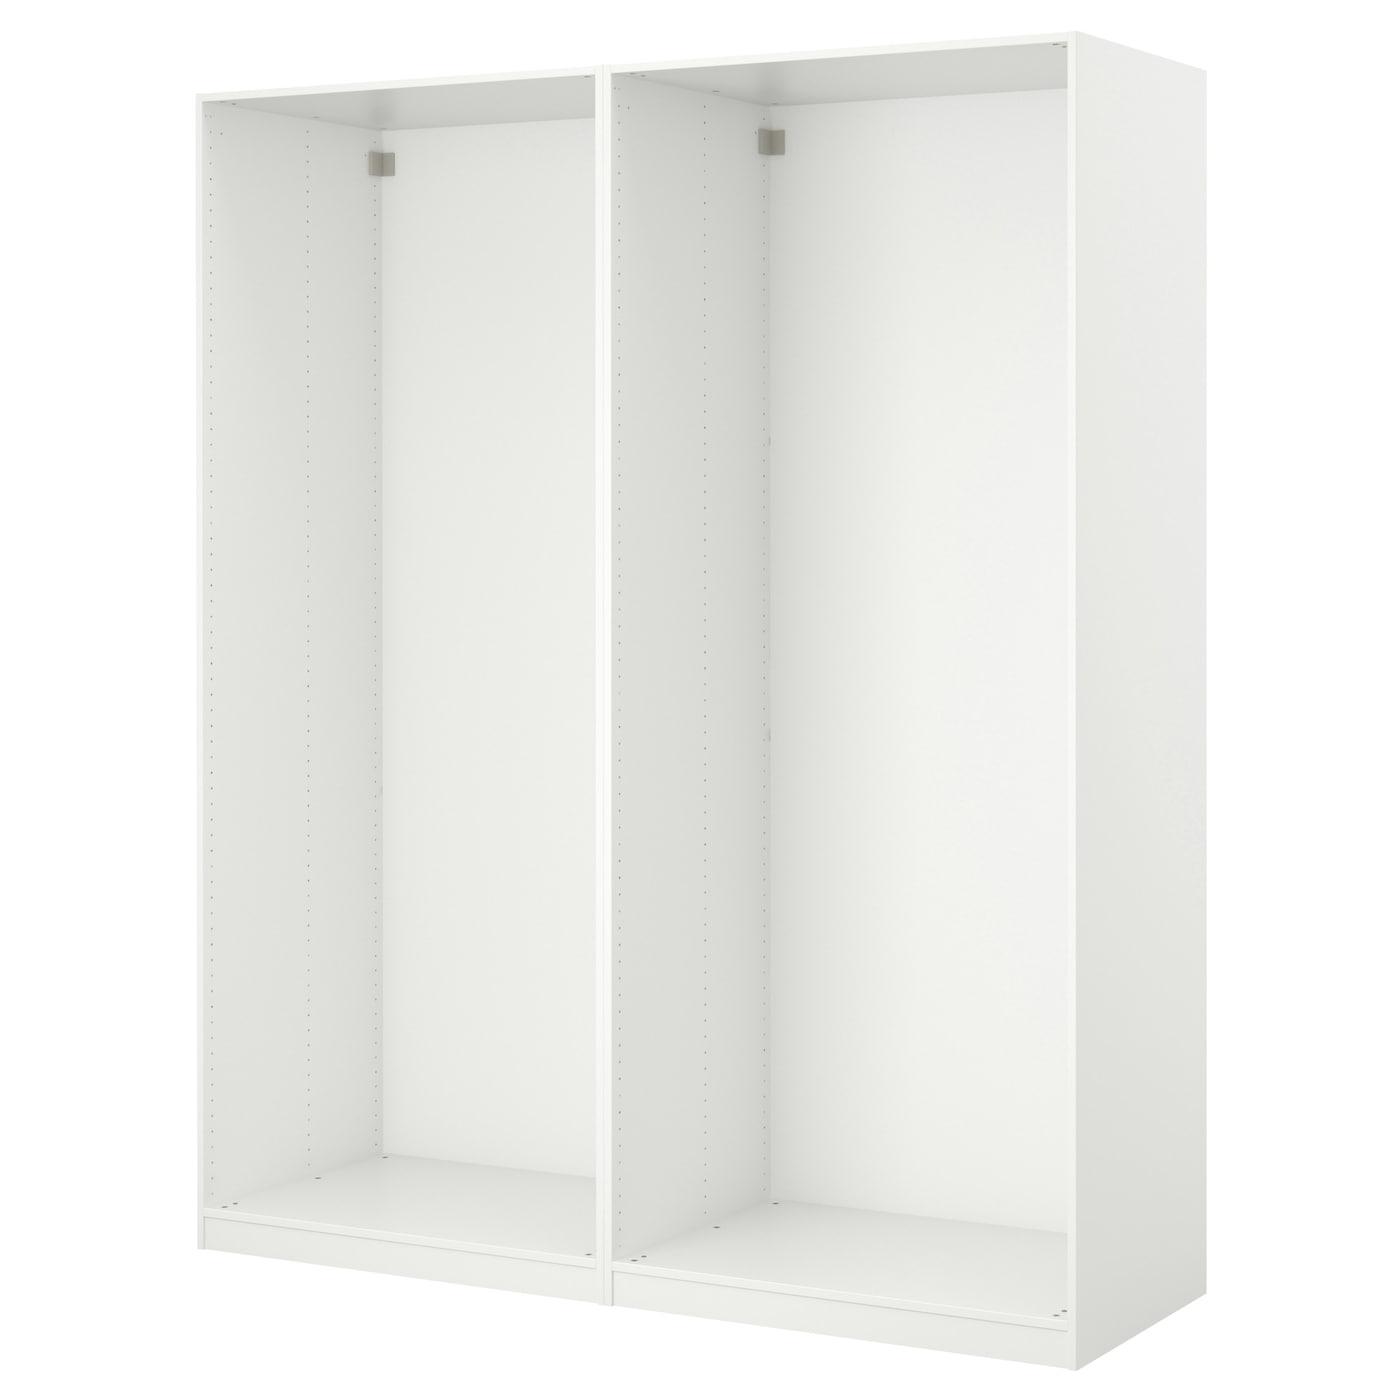 PAX Wardrobe With Sliding Doors White Auli Mirror Glass 200x44x236 Cm IKEA